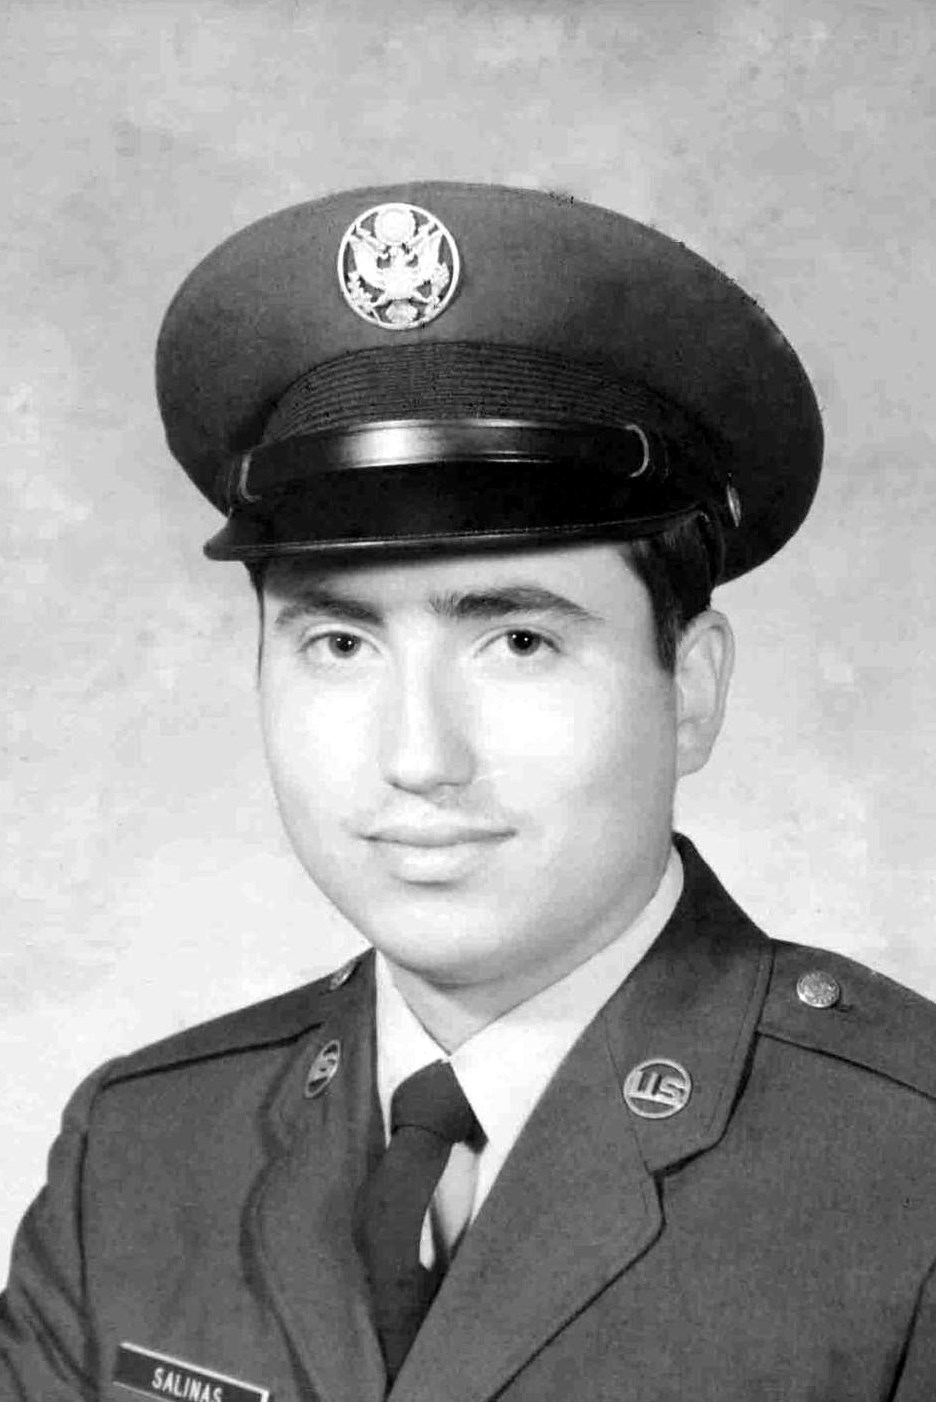 Raymond Fuentes Salinas Obituary - CLUTE, TX